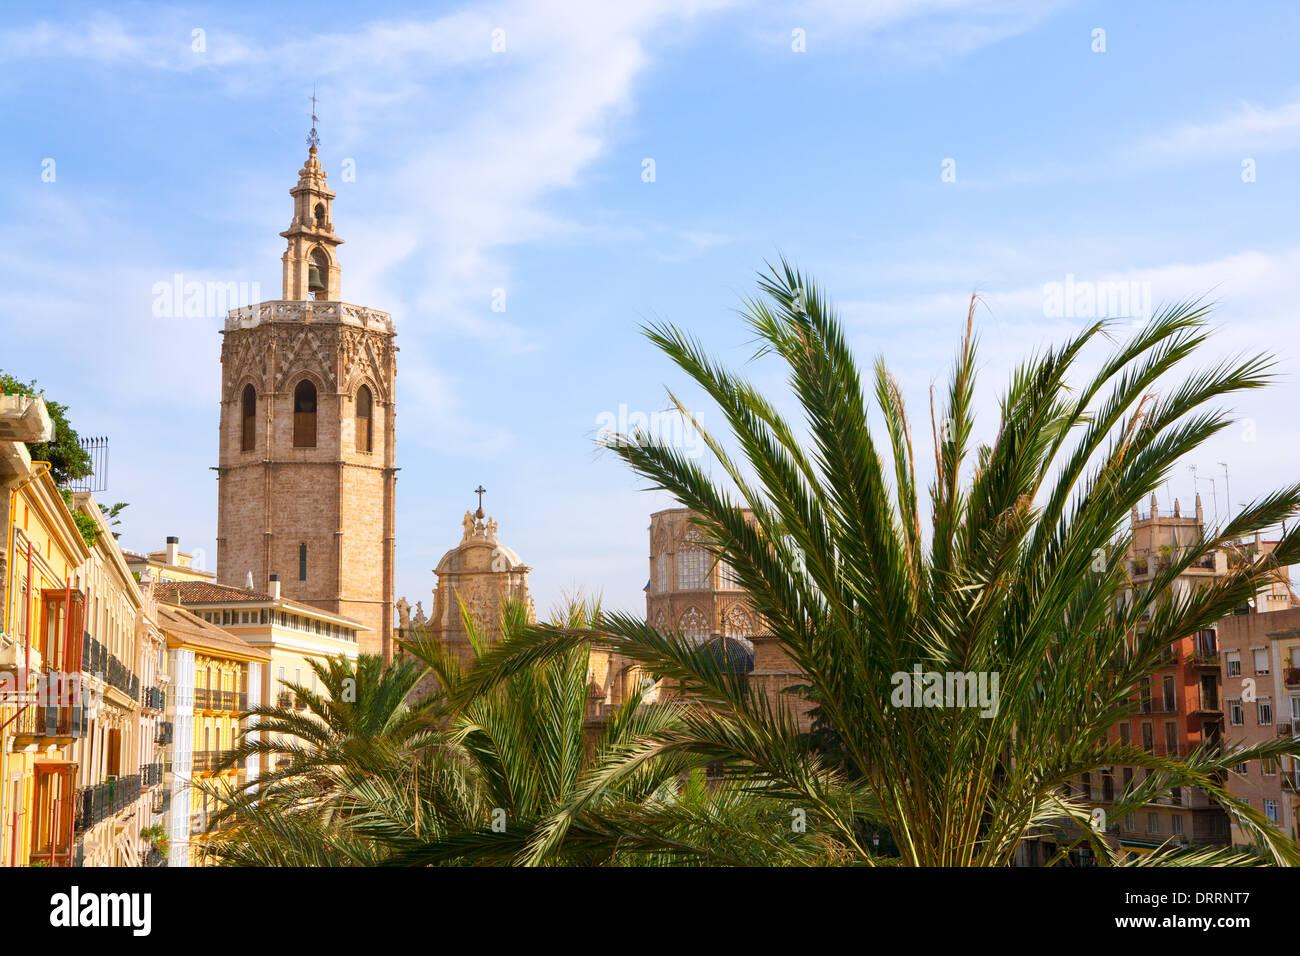 Valencia historic downtown El Miguelete and Cathedral Micalet de la Seu in spain - Stock Photo